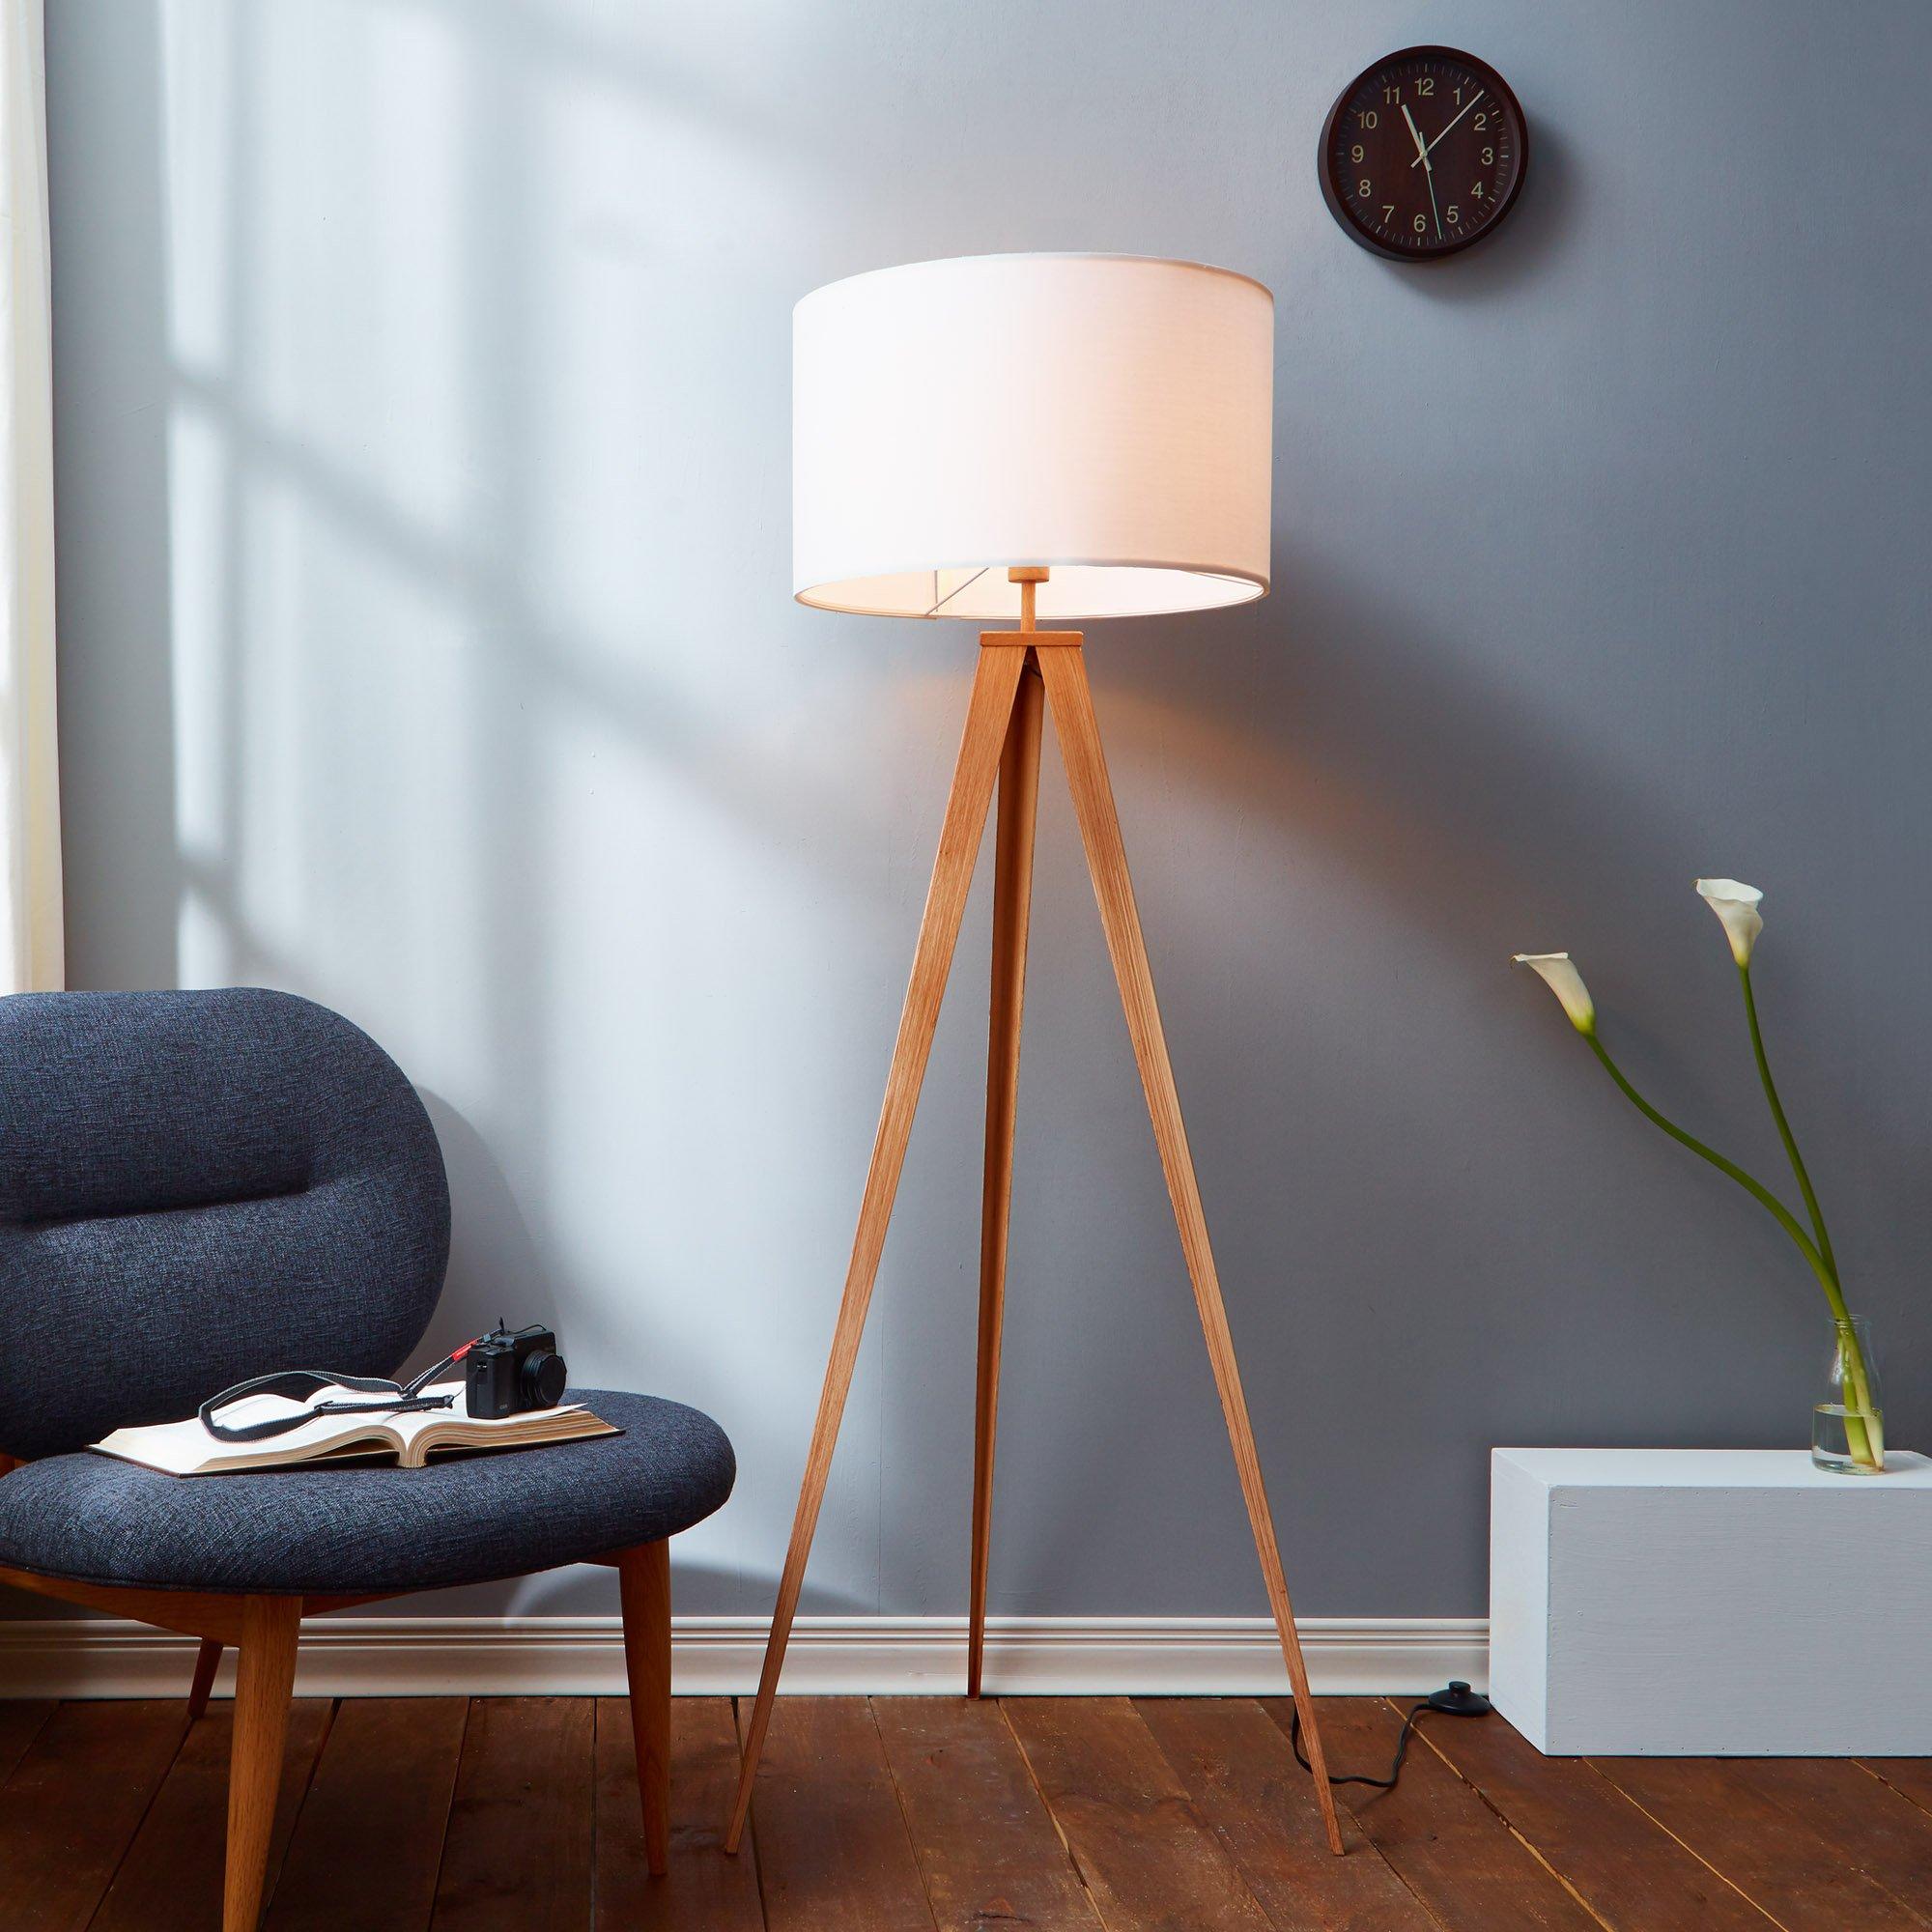 Versanora VN-L00007 Romanza Tripod Metal Legs LED Floor Lamp, White by Versanora